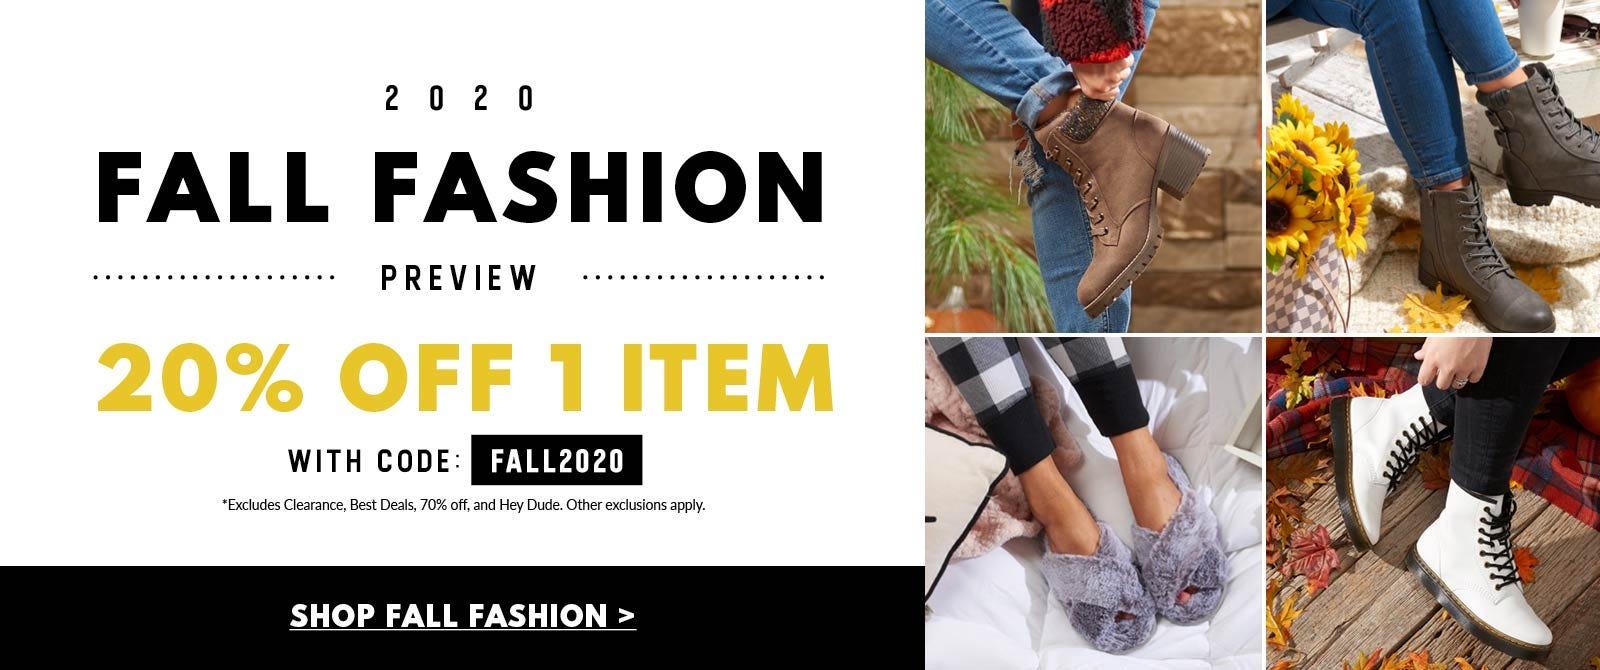 Fall Fashion Preview!